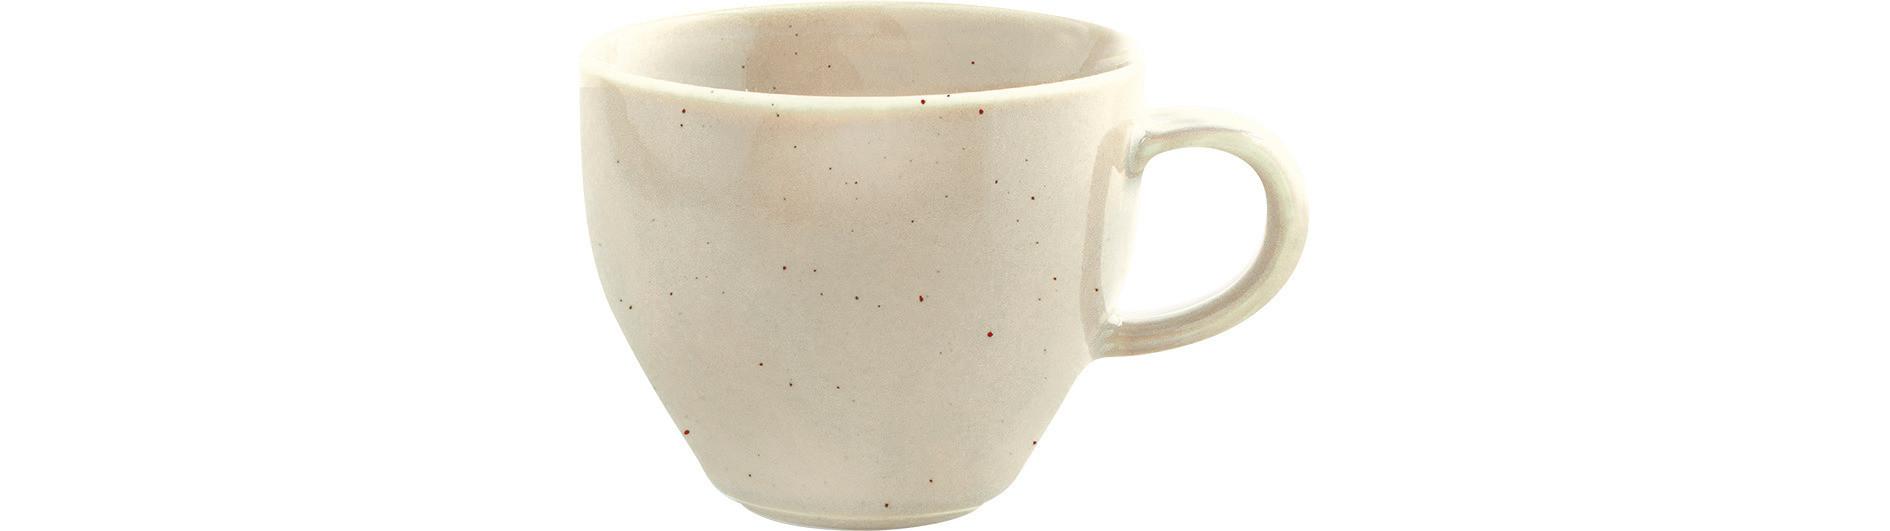 Homestyle, Milchkaffeetasse ø 101 mm / 0,30 l natural cotton